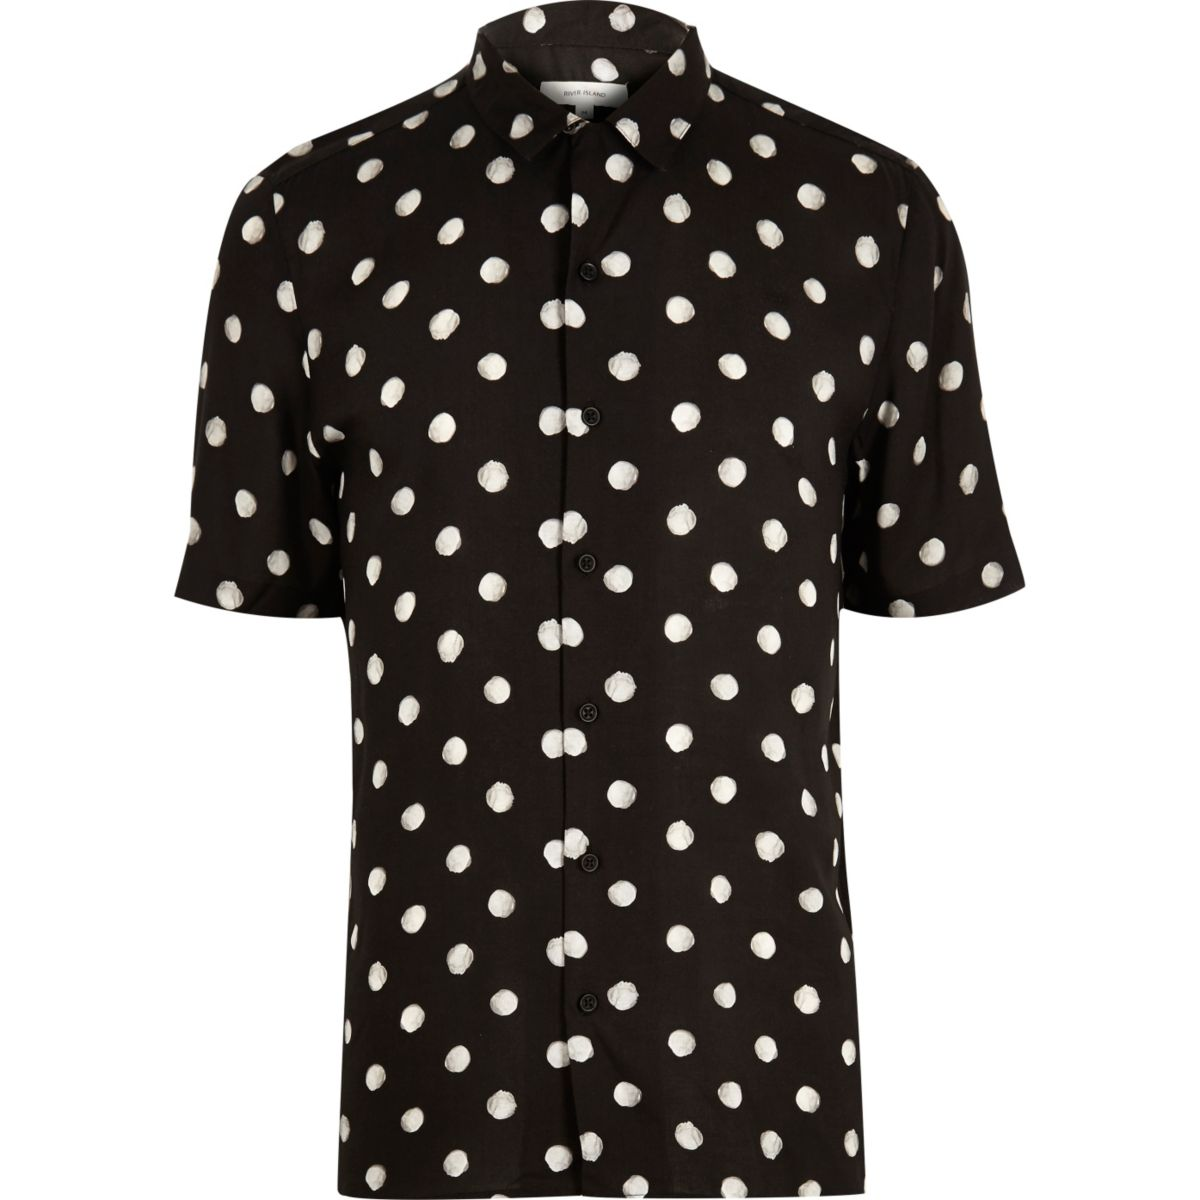 Schwarzes, kurzärmliges Hemd